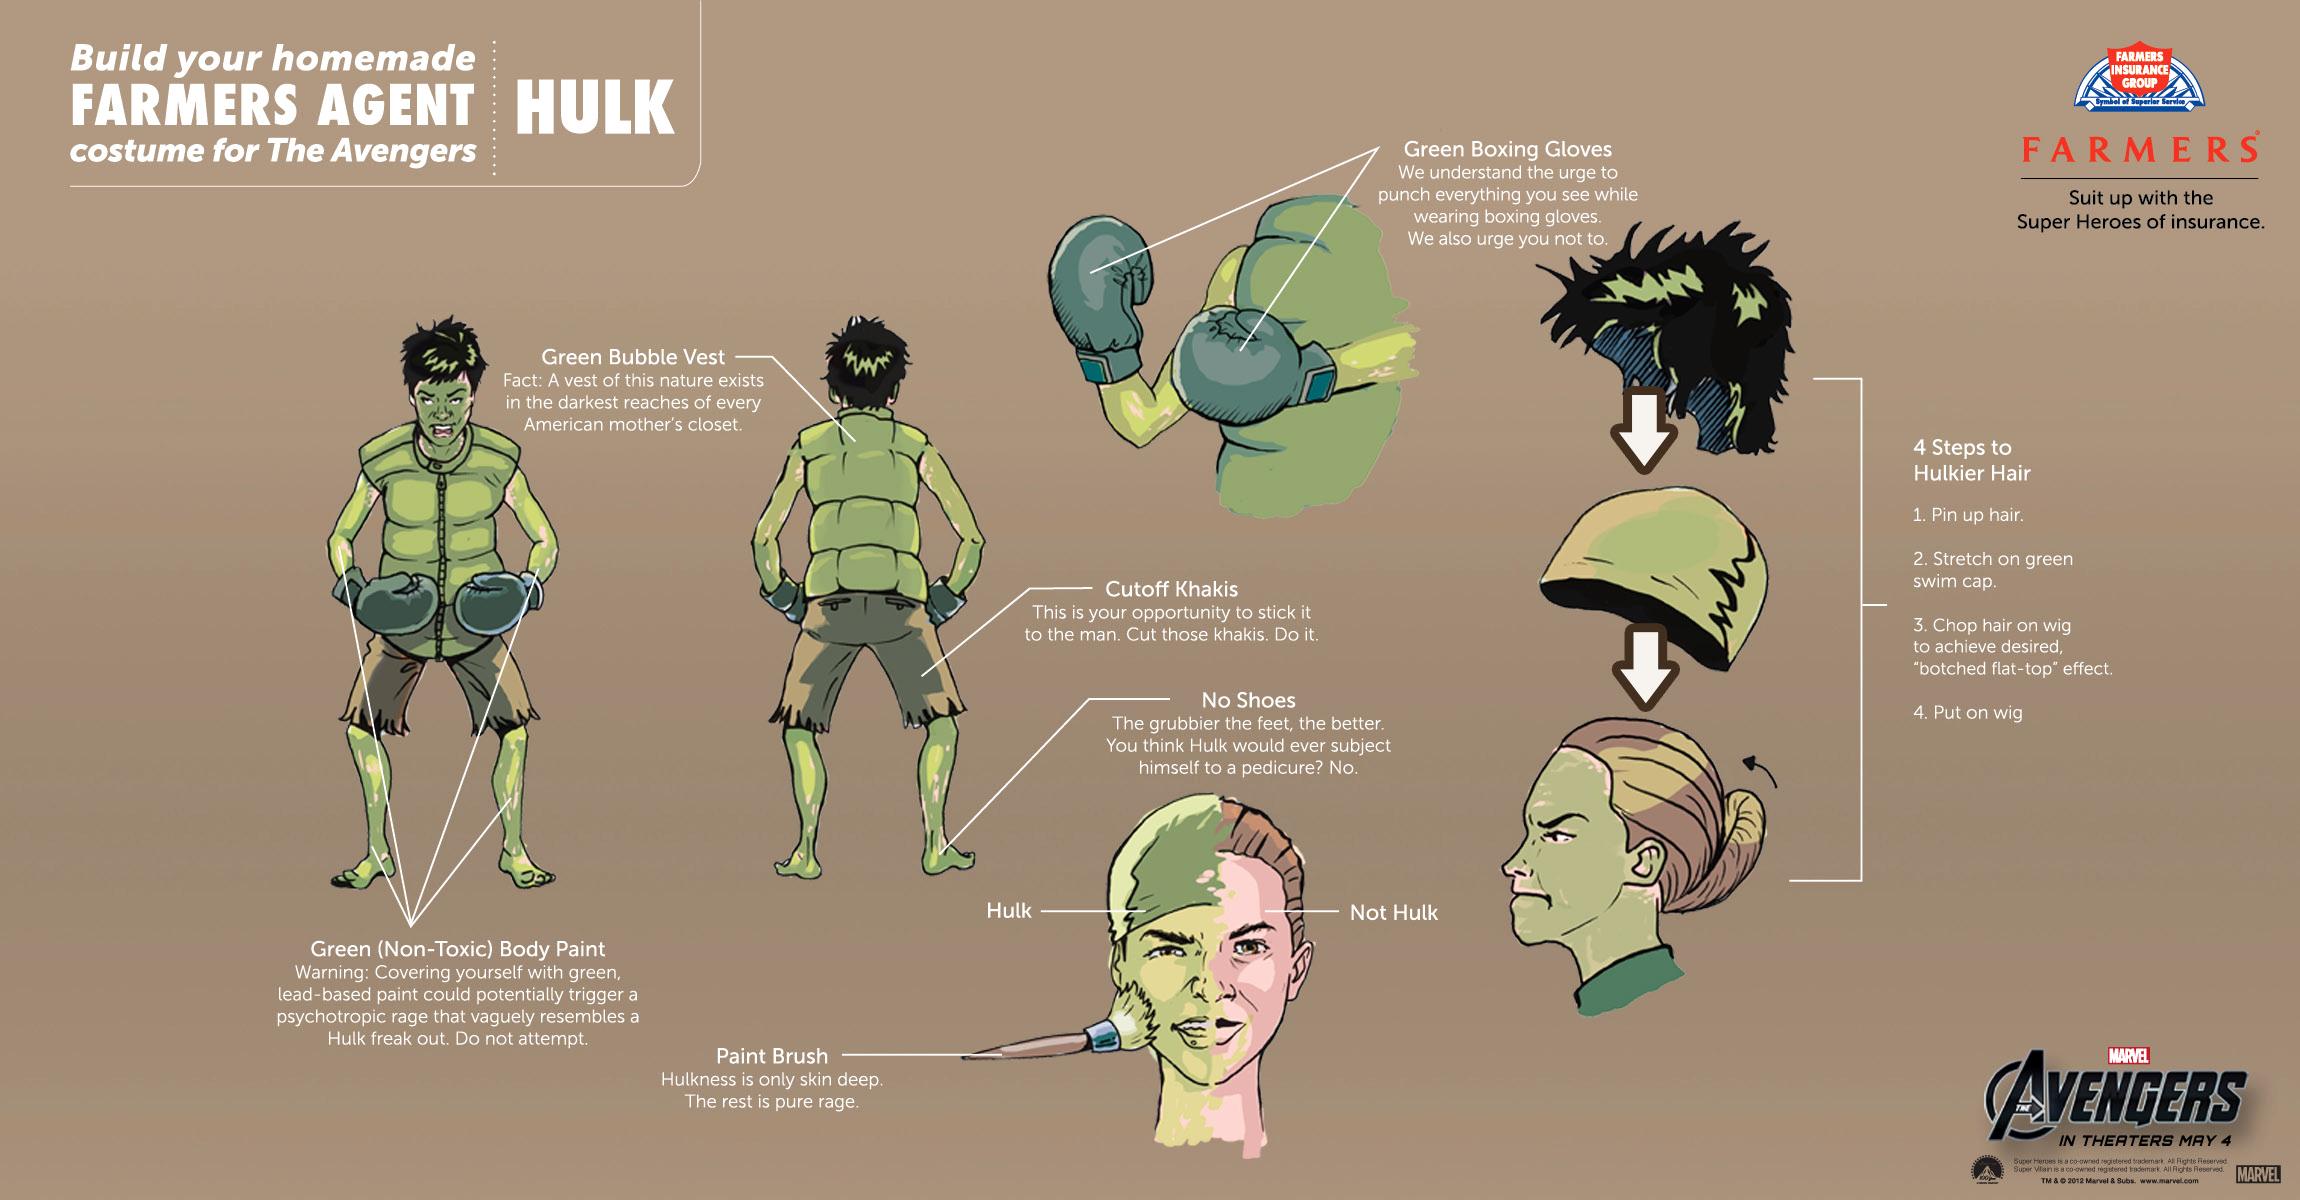 Farmers insurance build your own costume hulk print image editors pick solutioingenieria Images